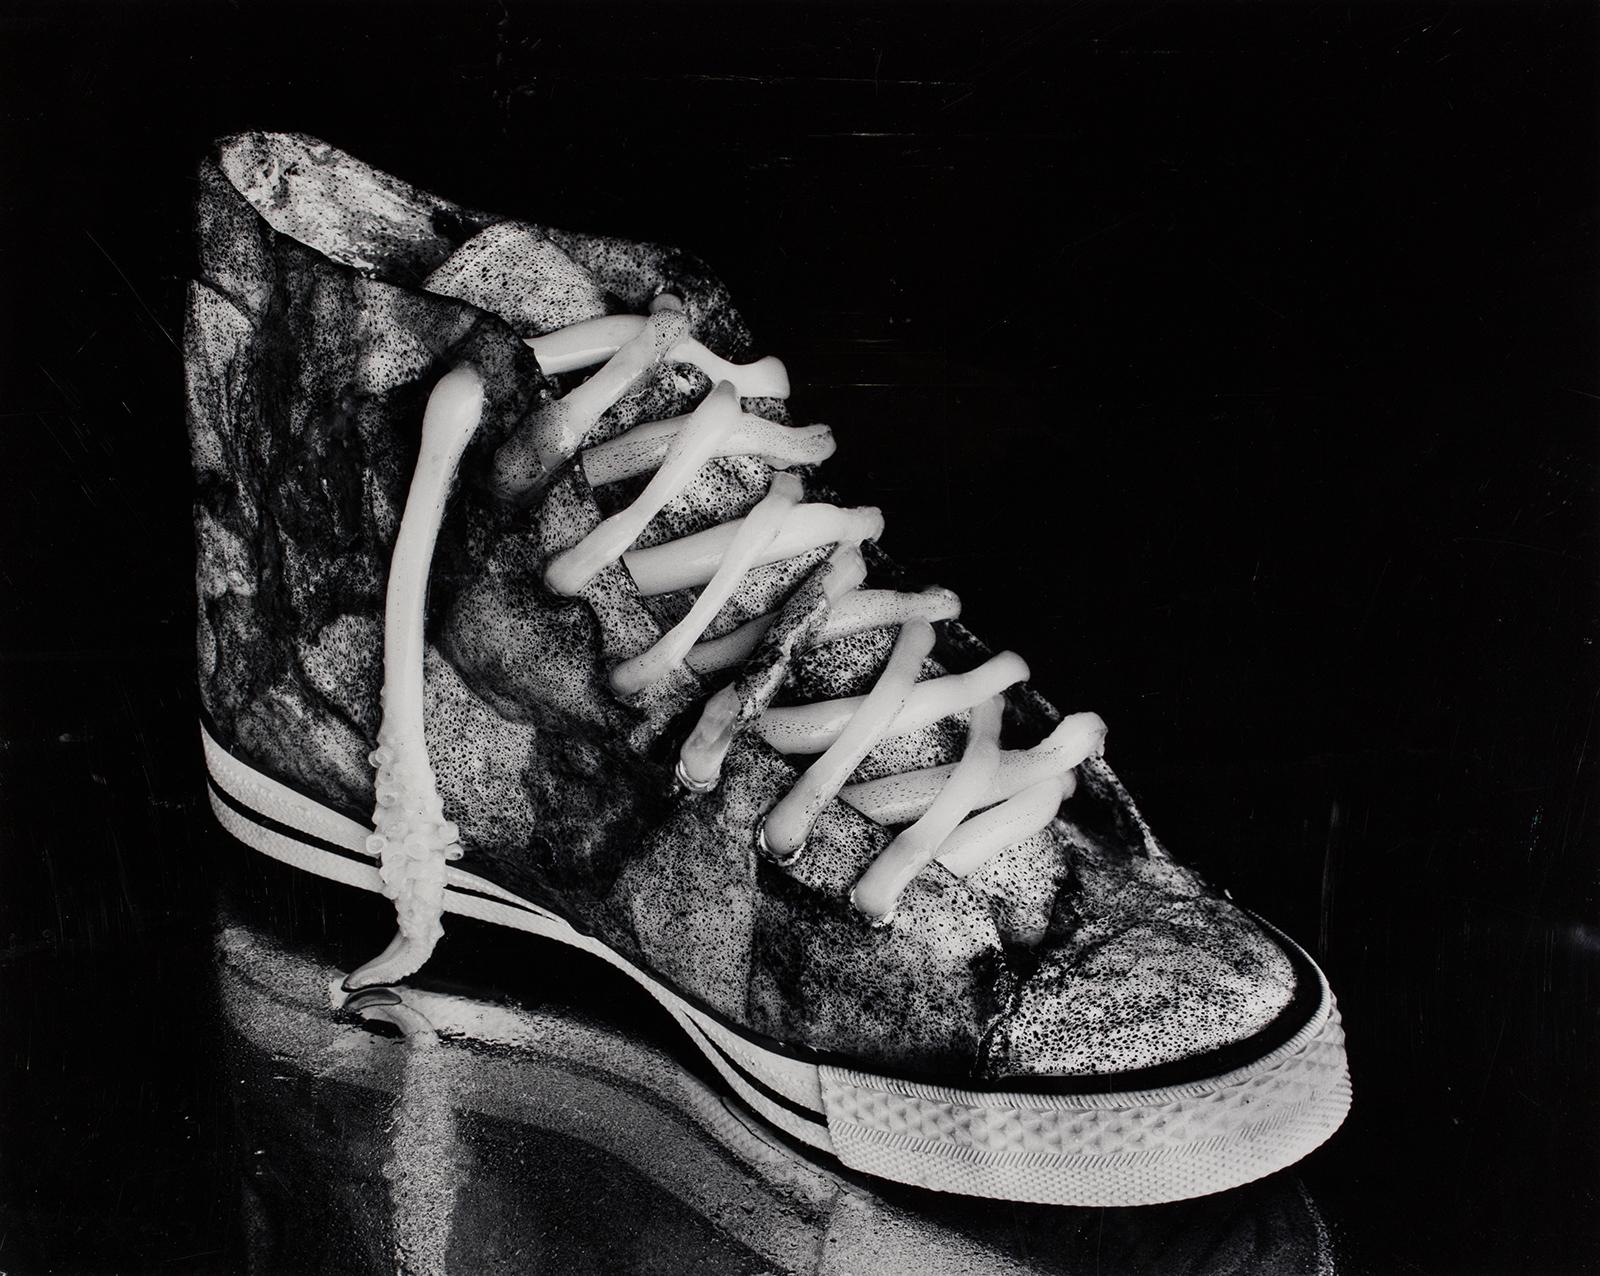 Michiko Kon, Cuttlefish and Sneaker, 1989